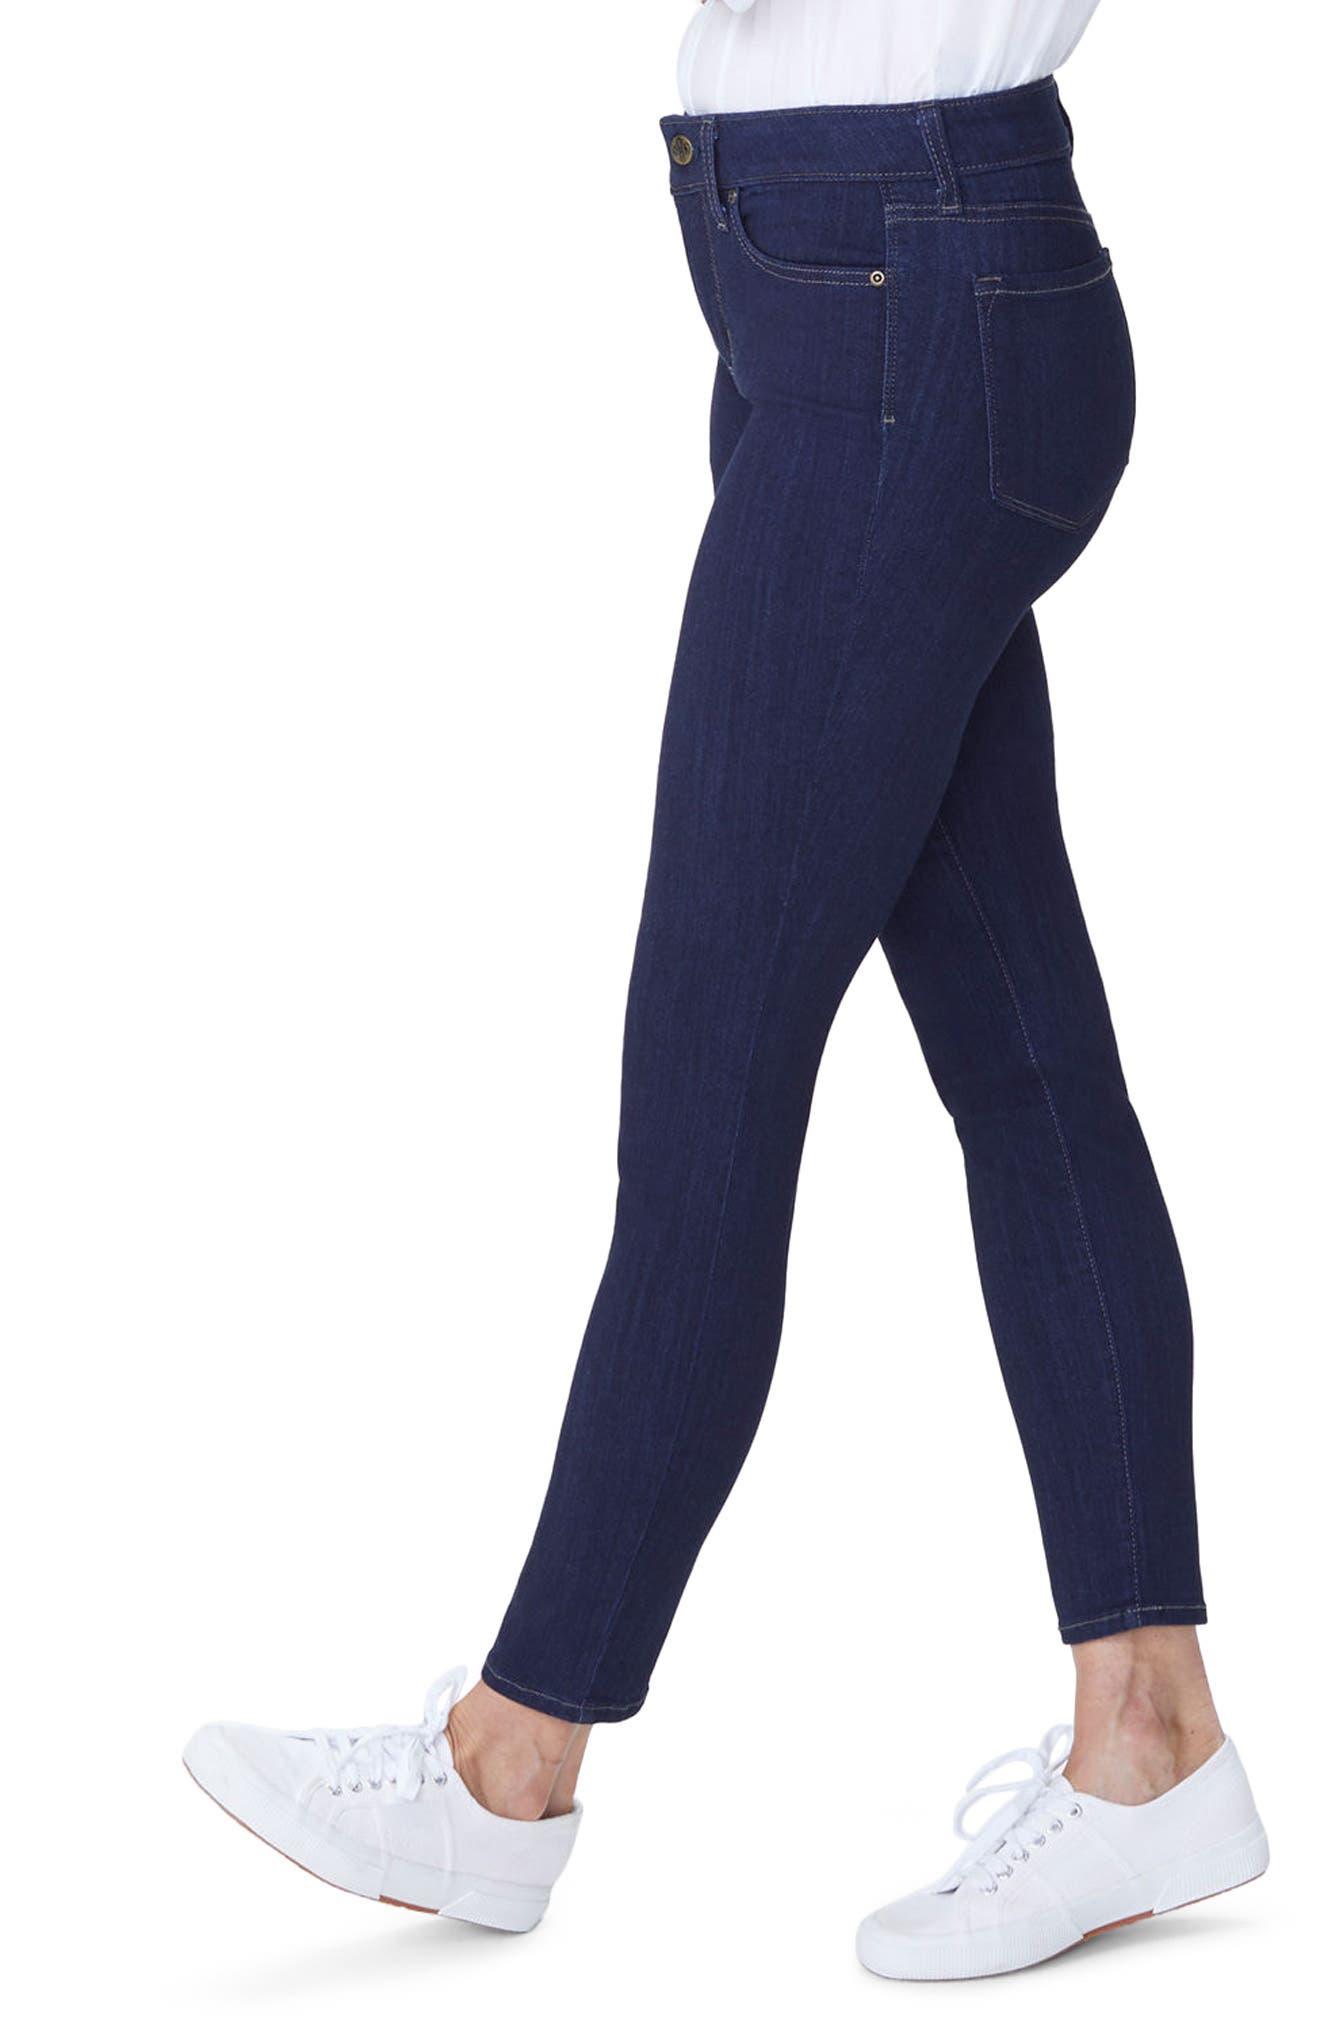 Ami Skinny Jeans,                             Alternate thumbnail 3, color,                             464